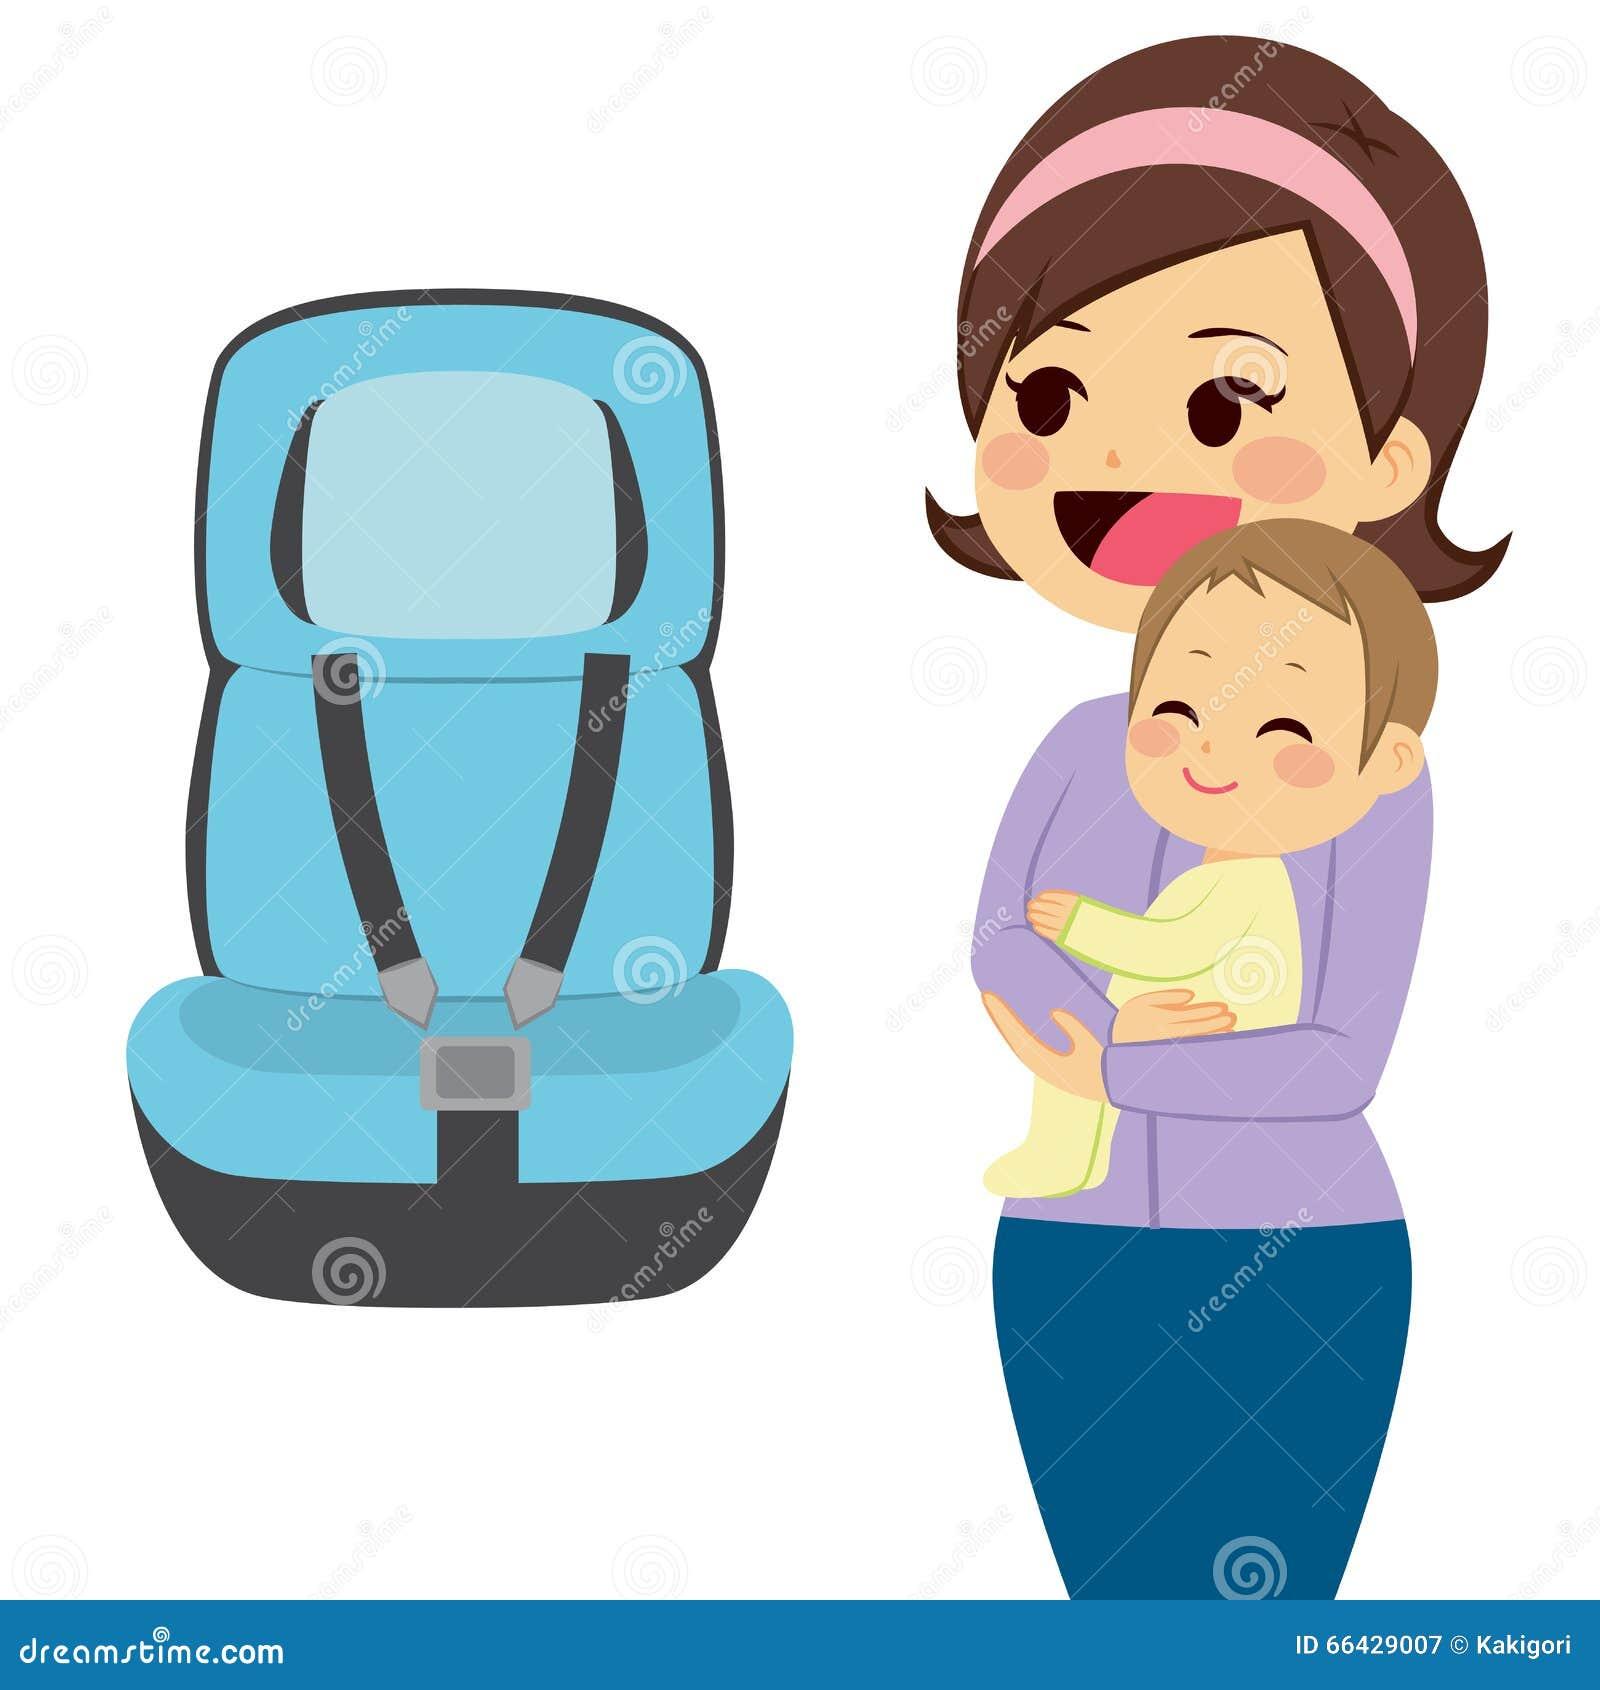 Baby Car Seat Stock Vector Illustration Of Cartoon Chair